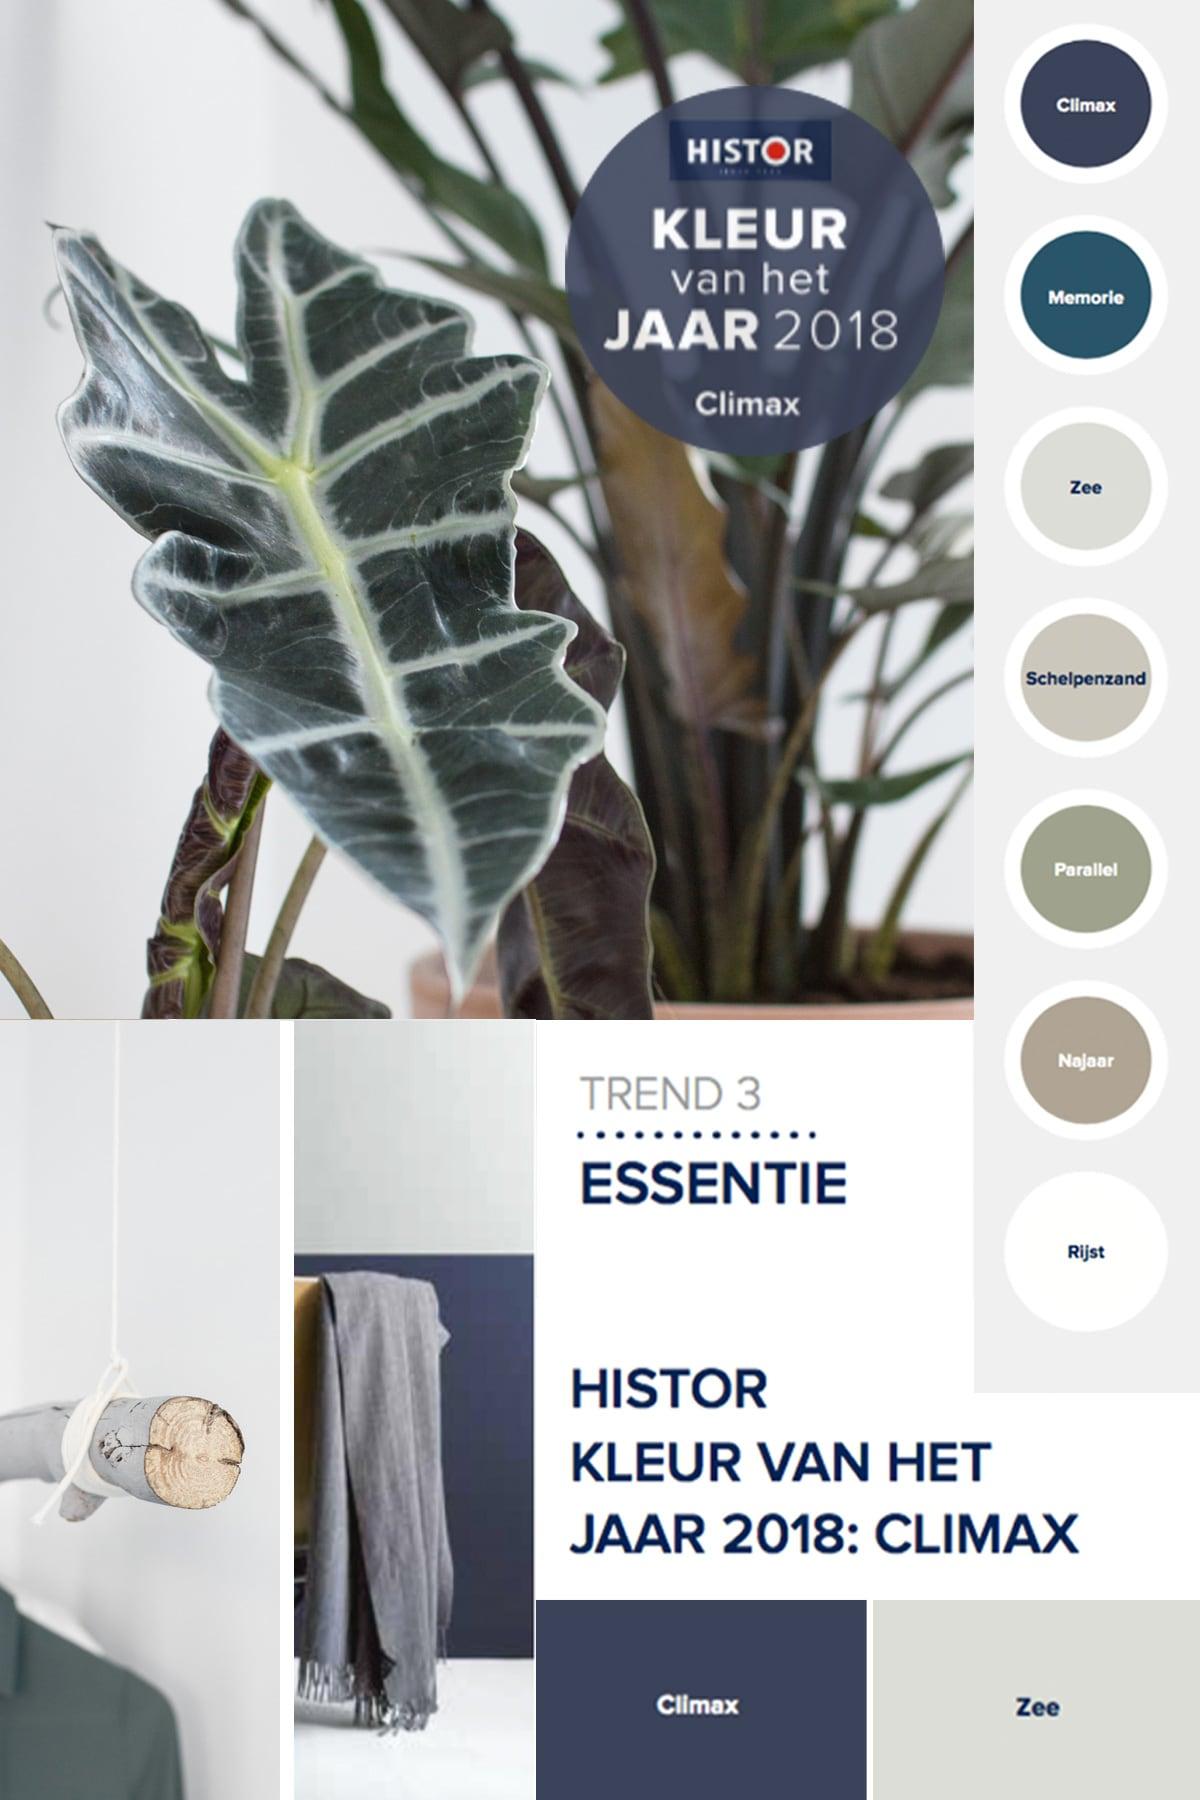 Histor climax moodboard - Tanja van Hoogdalem